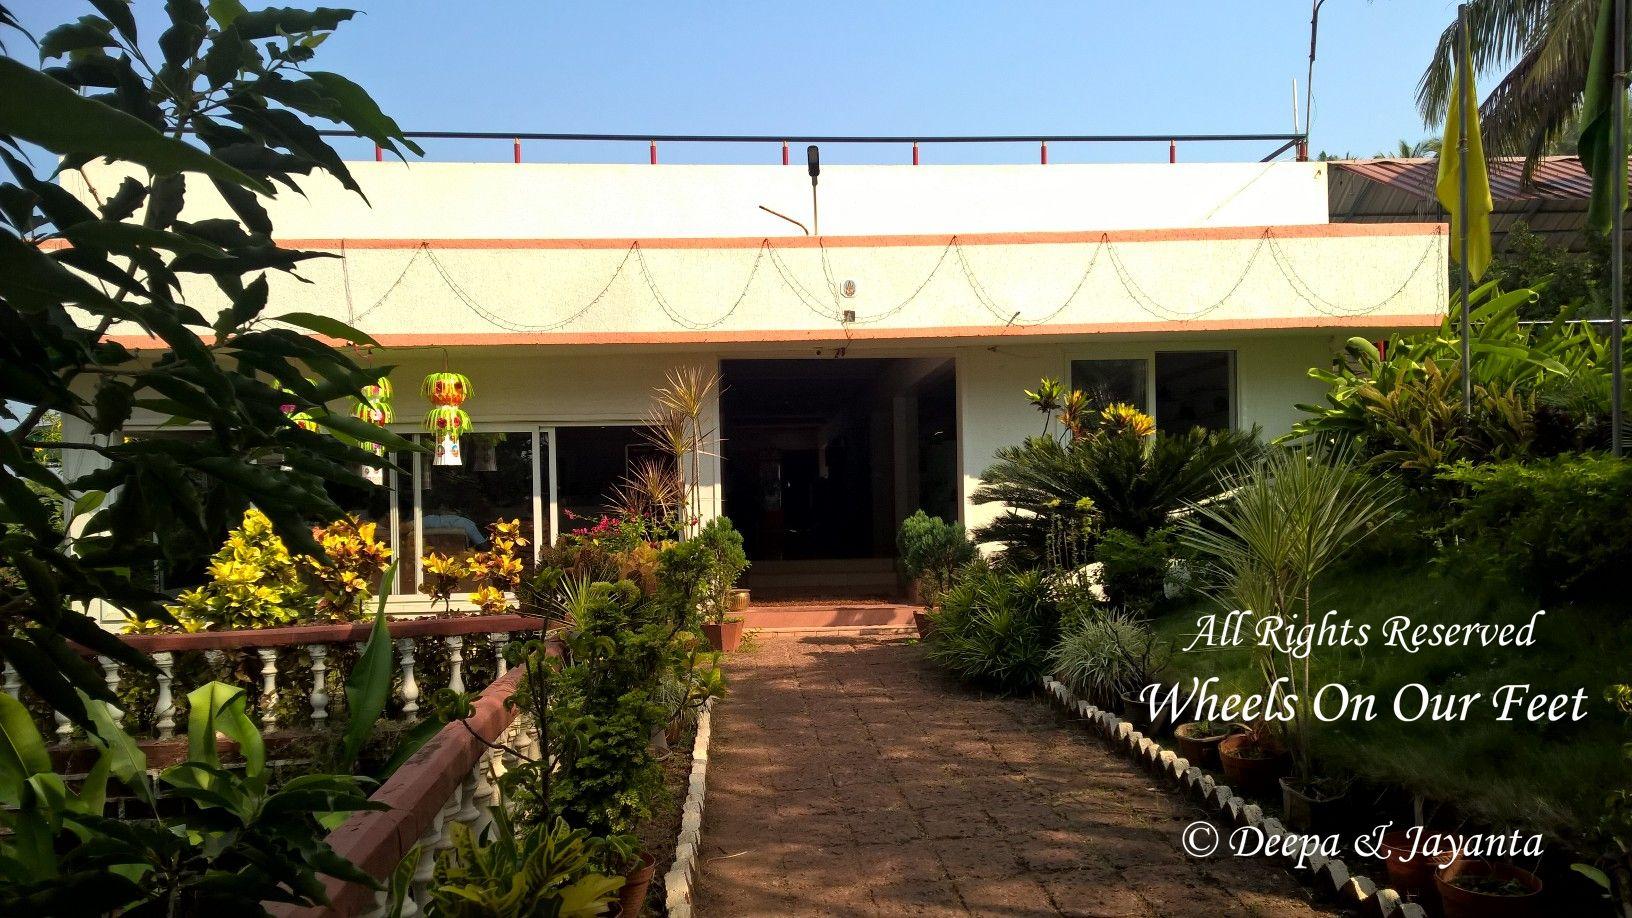 Abhishek Beach Resort & Spa in Ganapatiphule